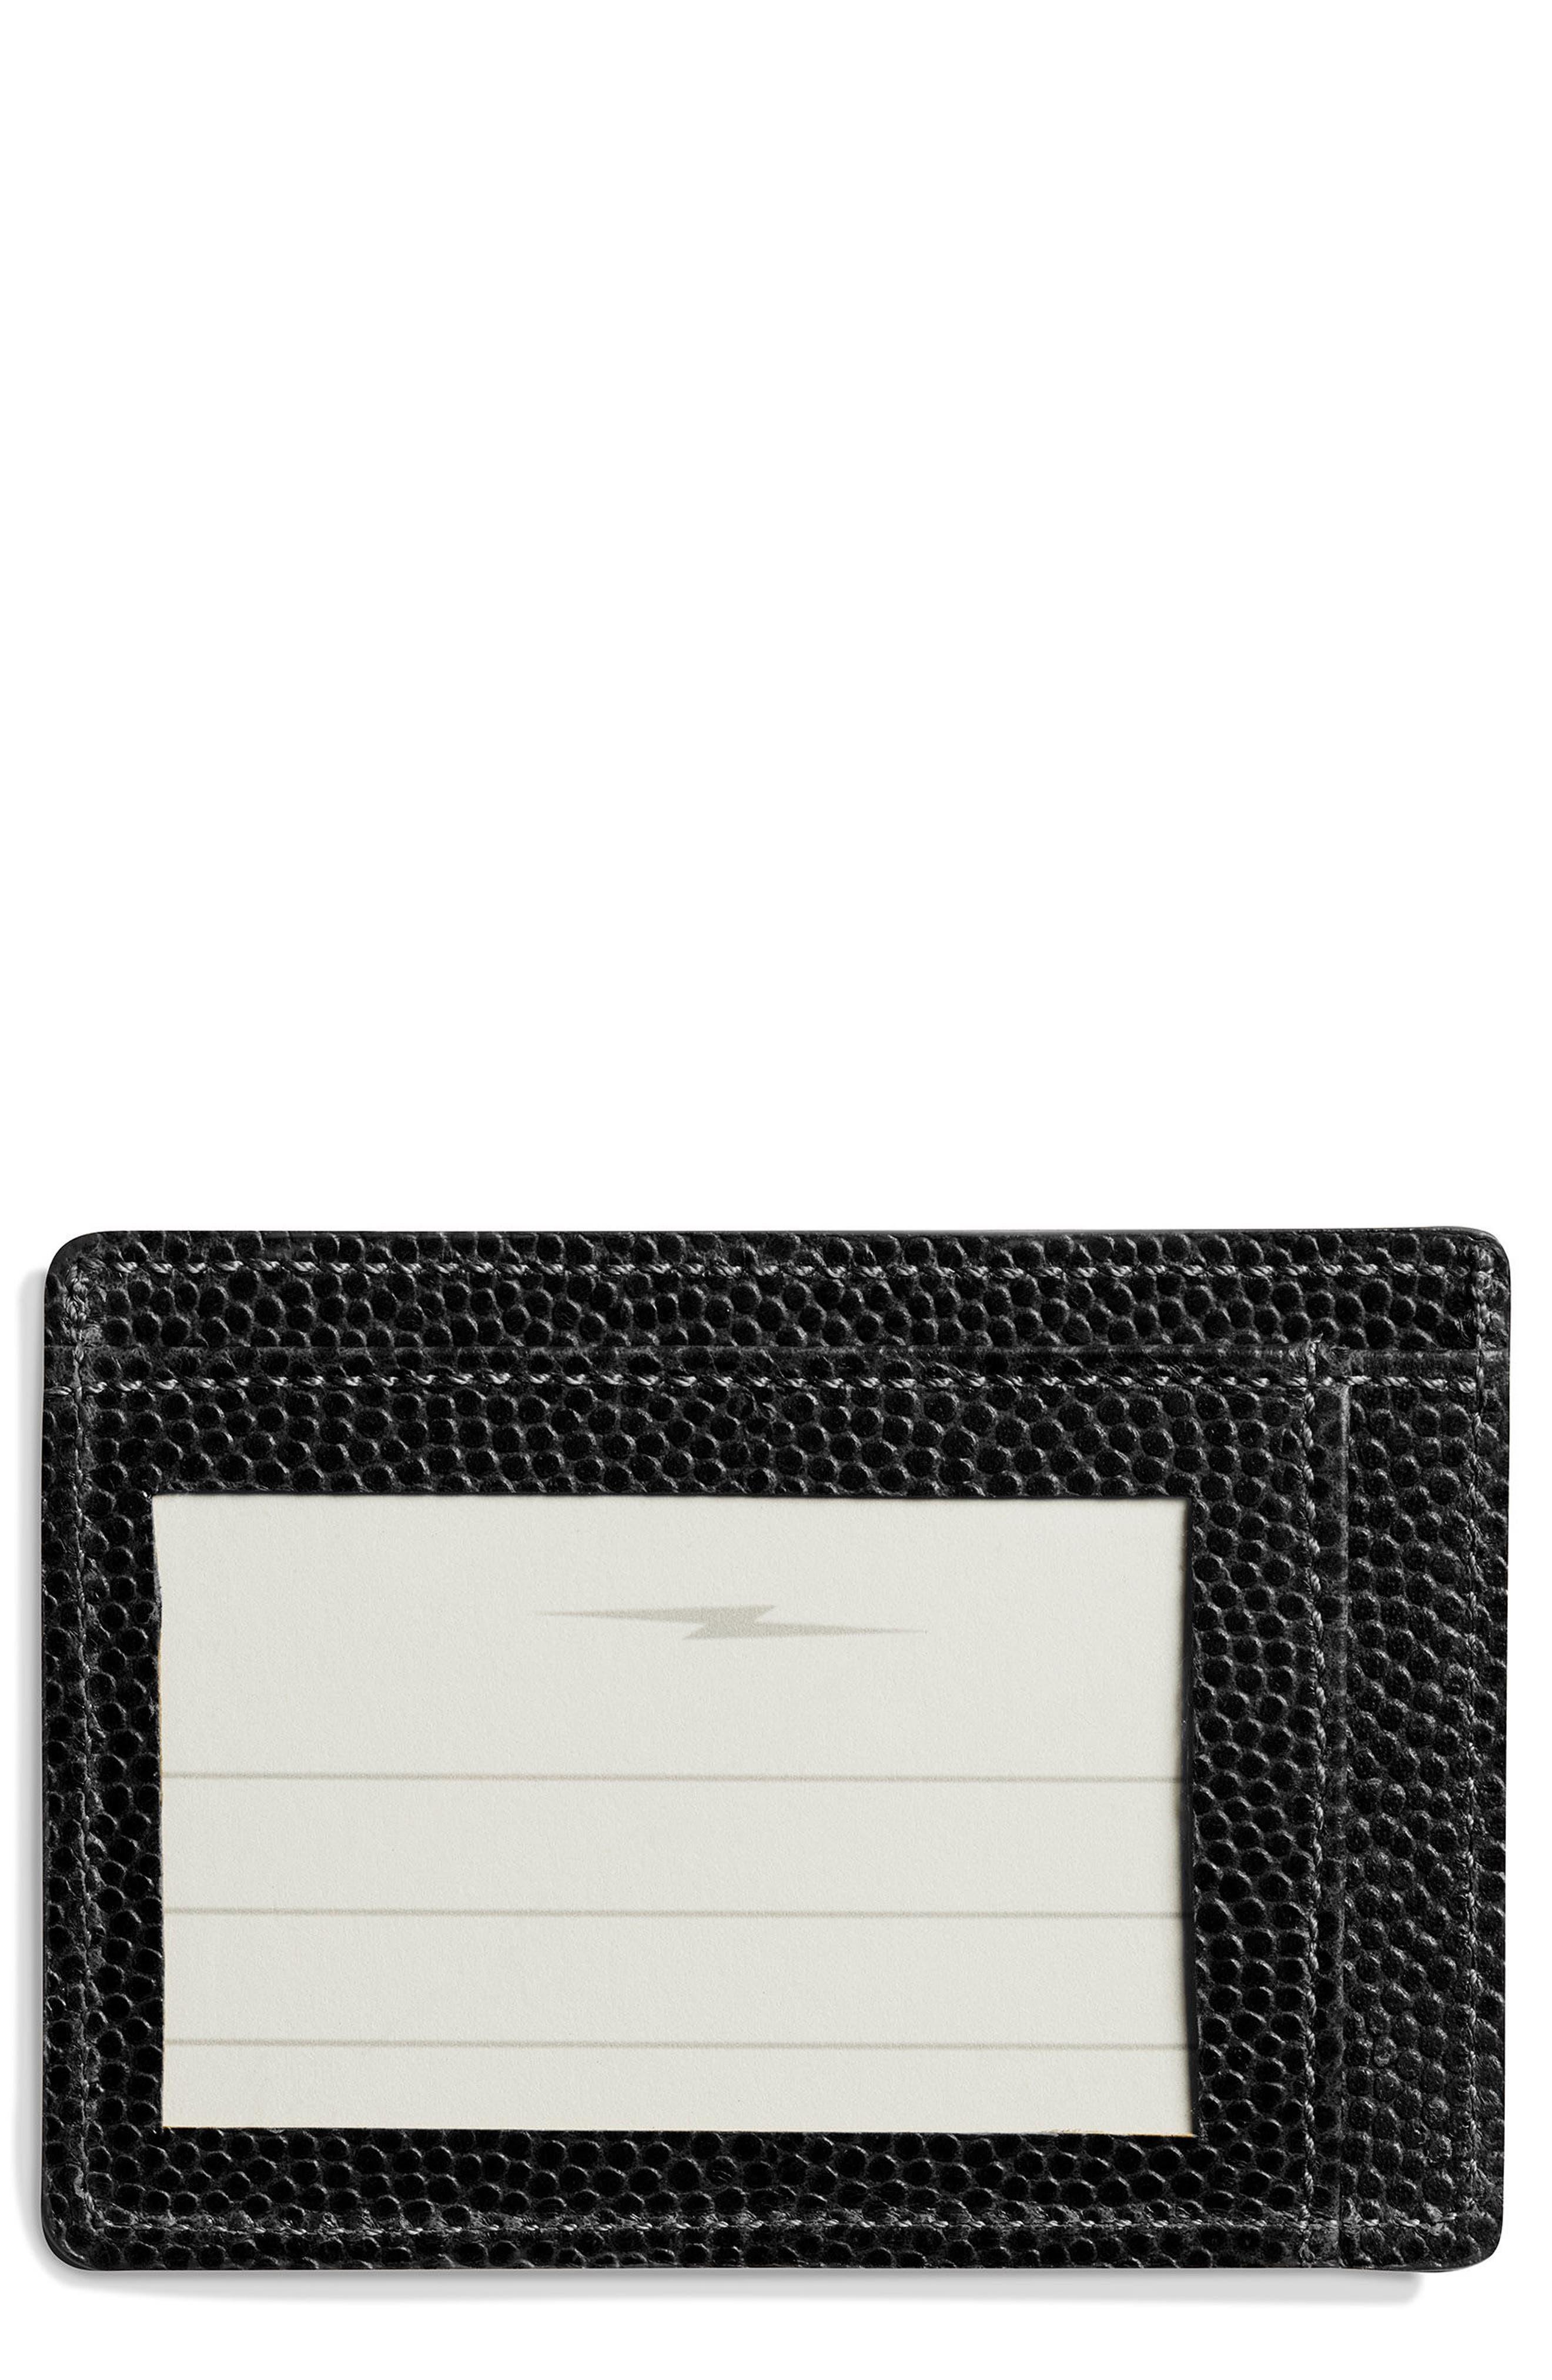 Latigo Leather Card Case,                         Main,                         color,